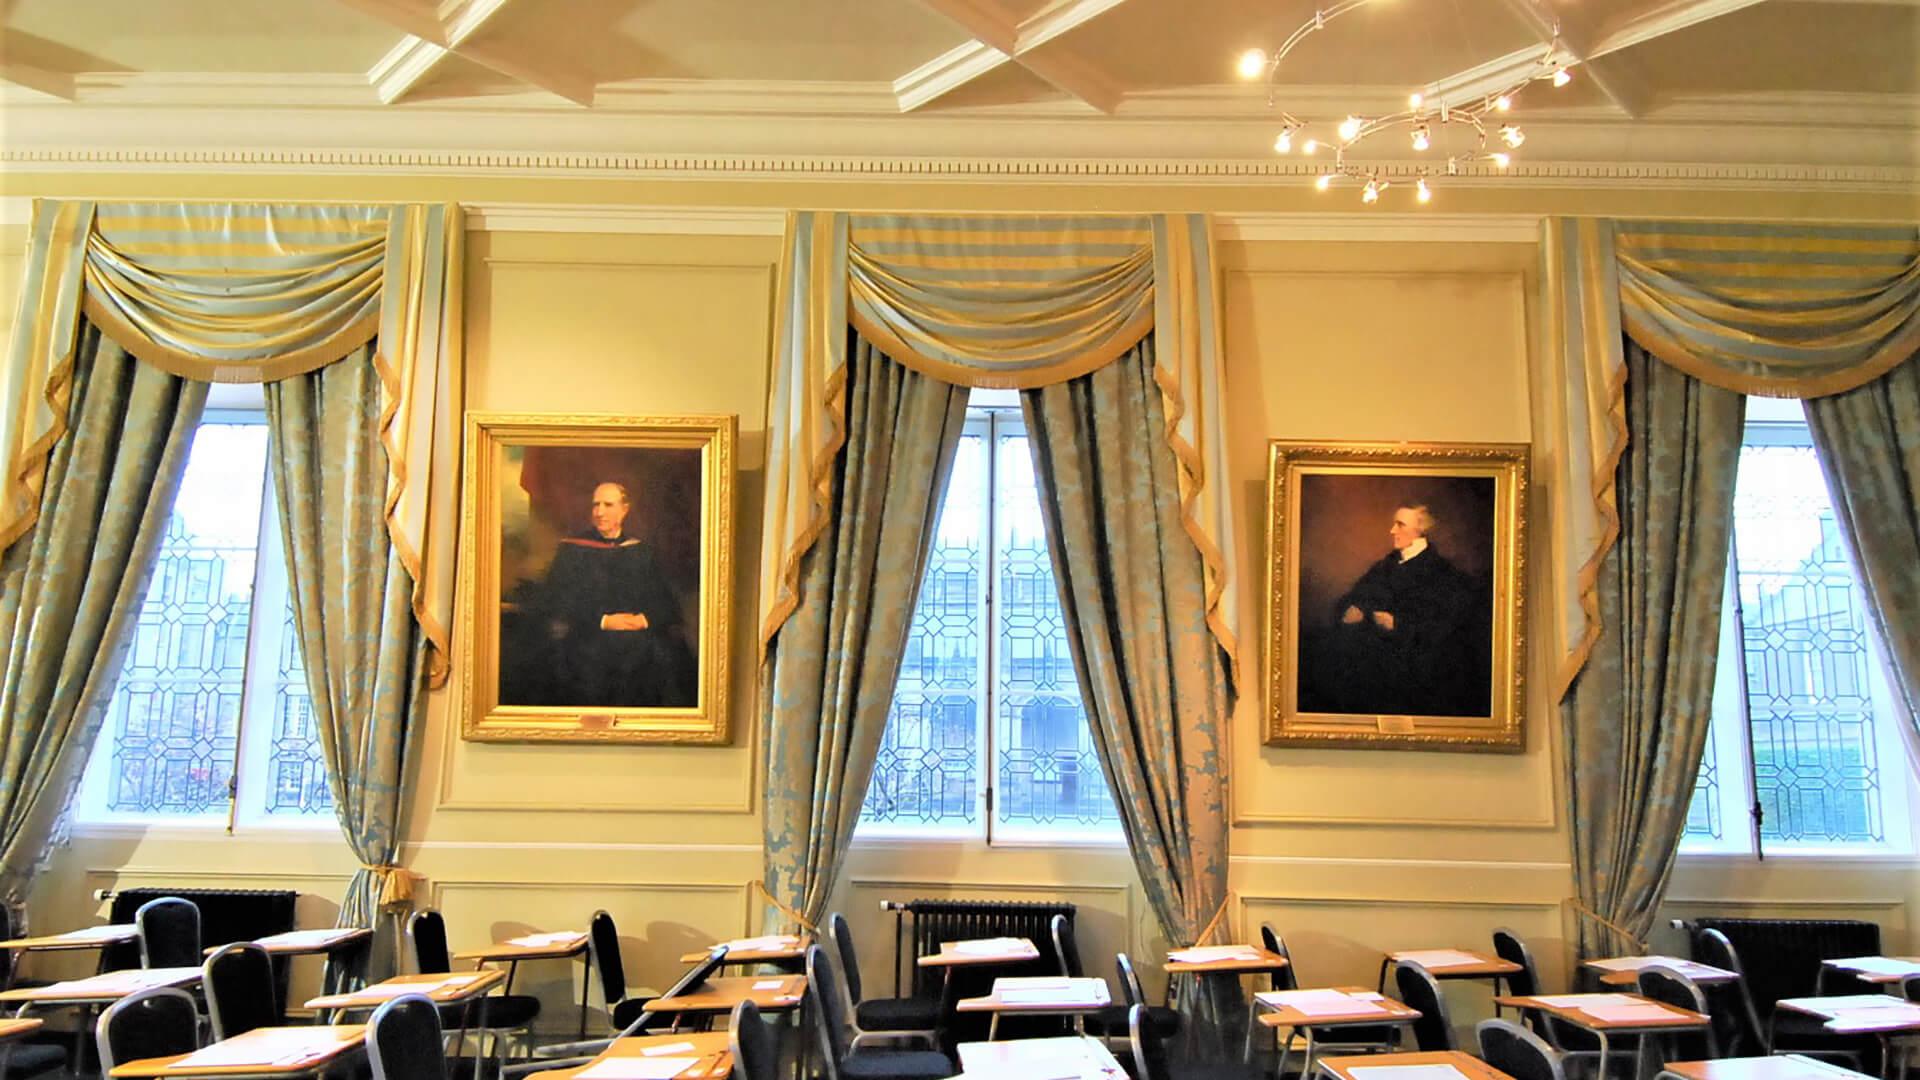 recreating historical room decor